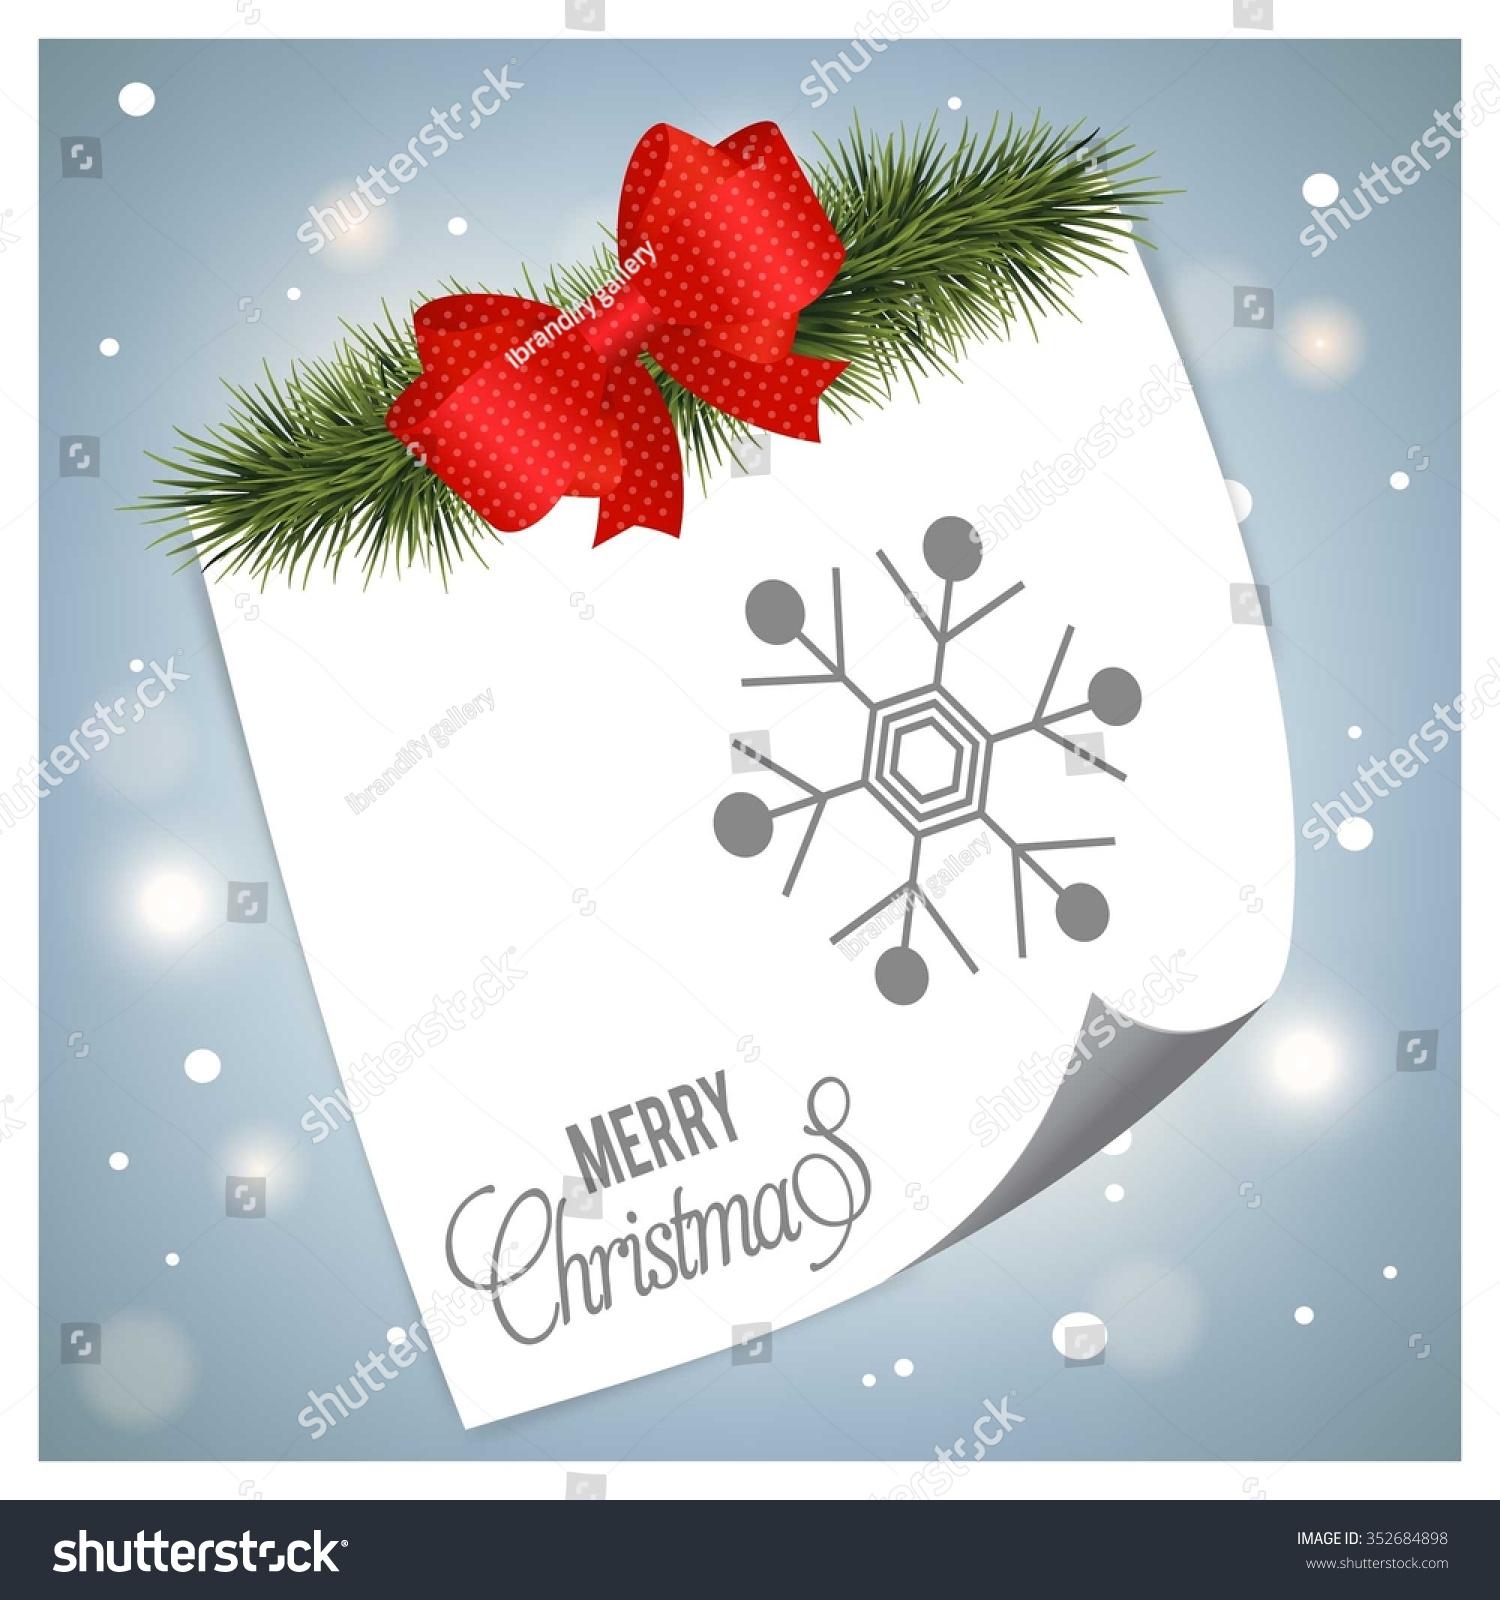 Merry Christmas Greetings Card Design Snow Stock Vector (Royalty ...